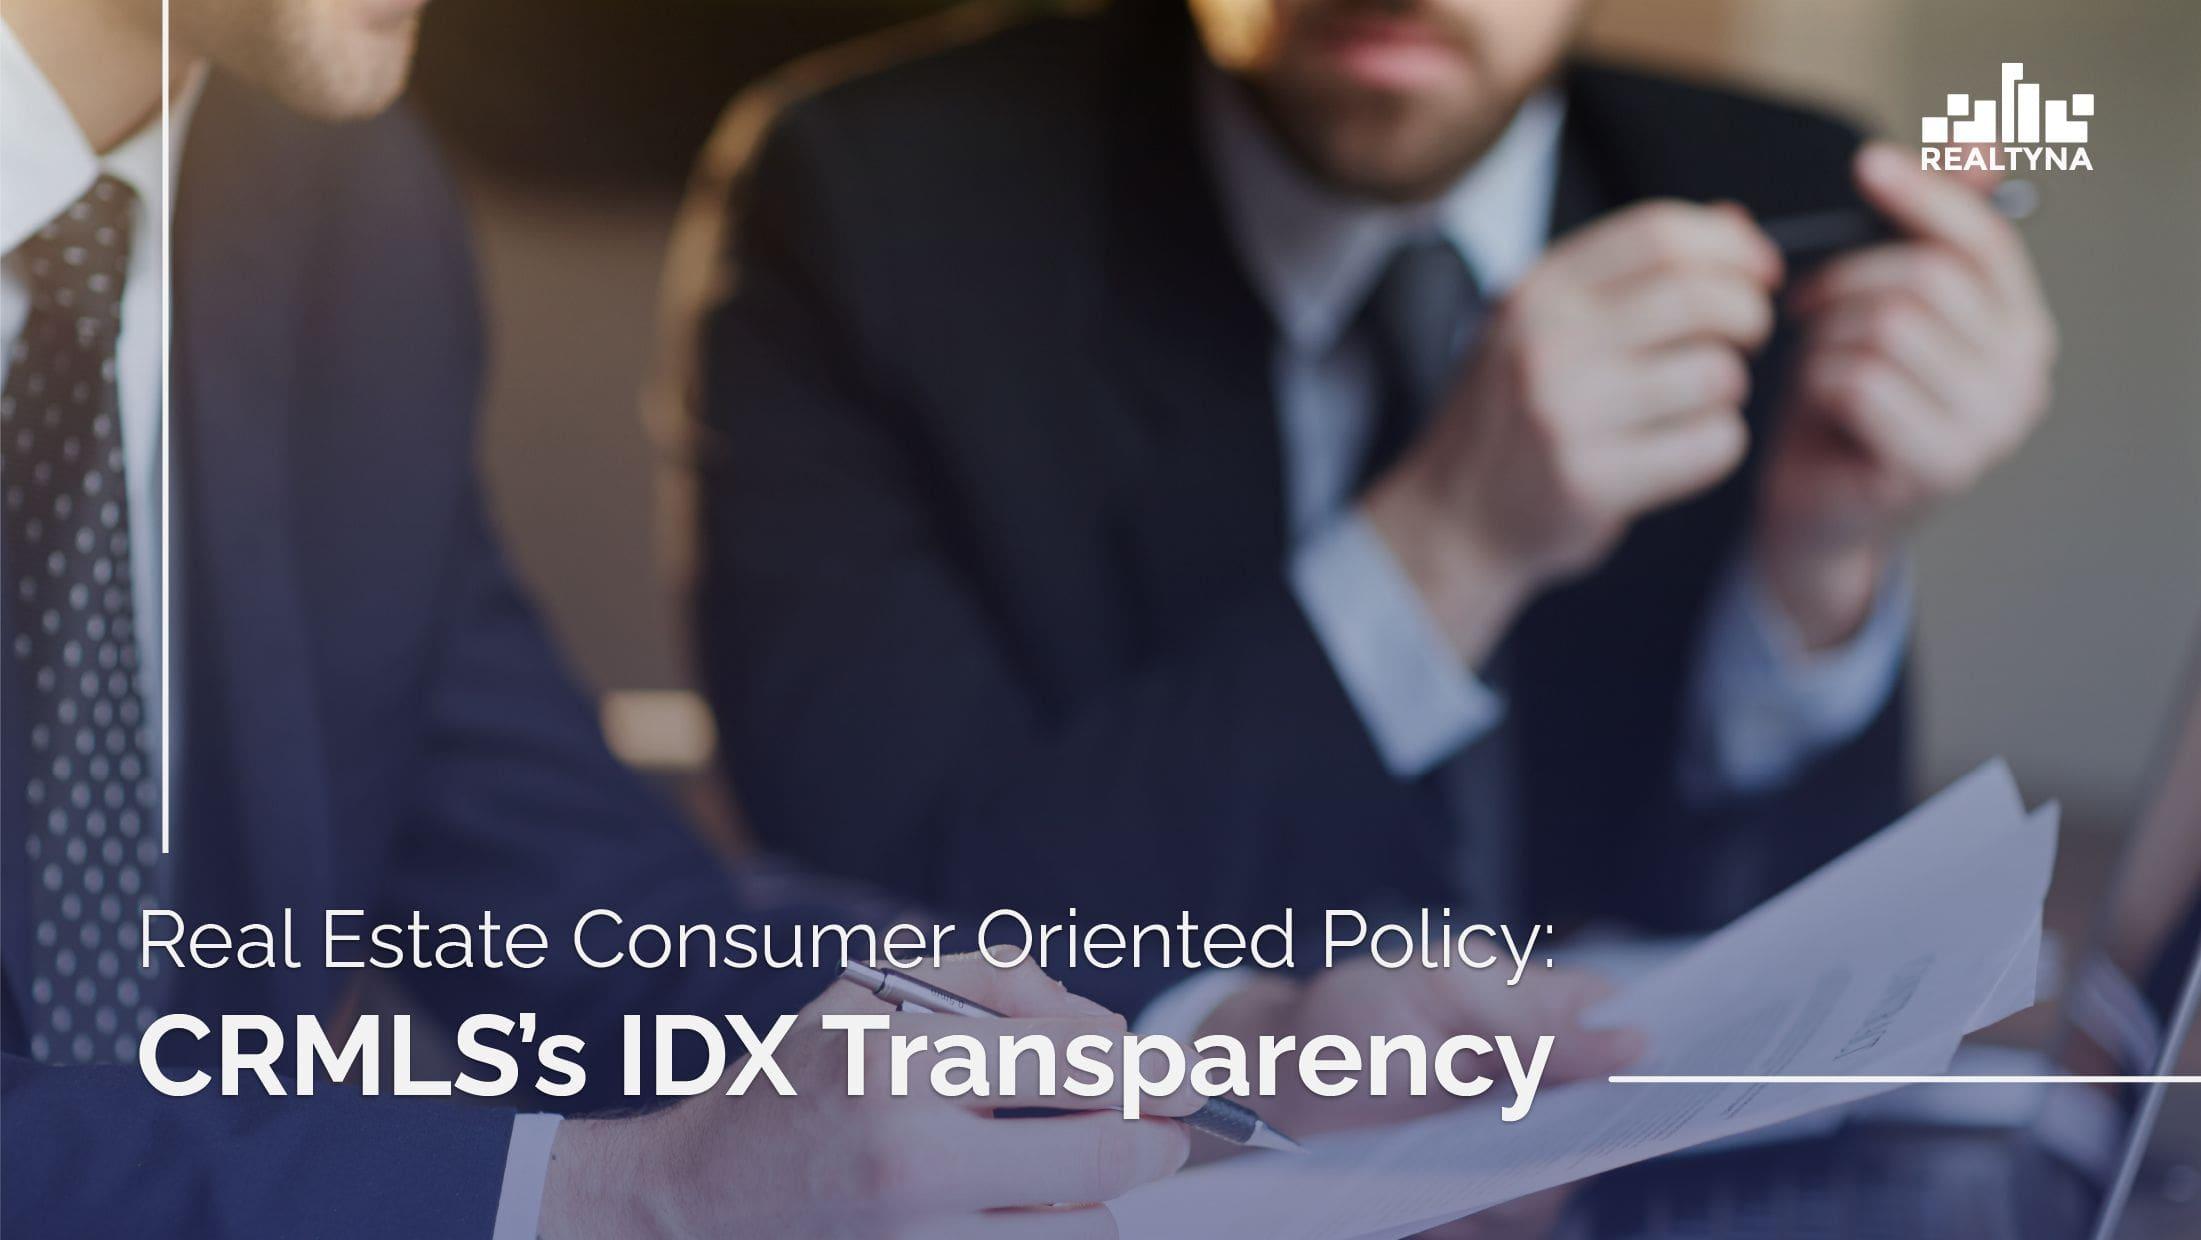 IDX Transparency